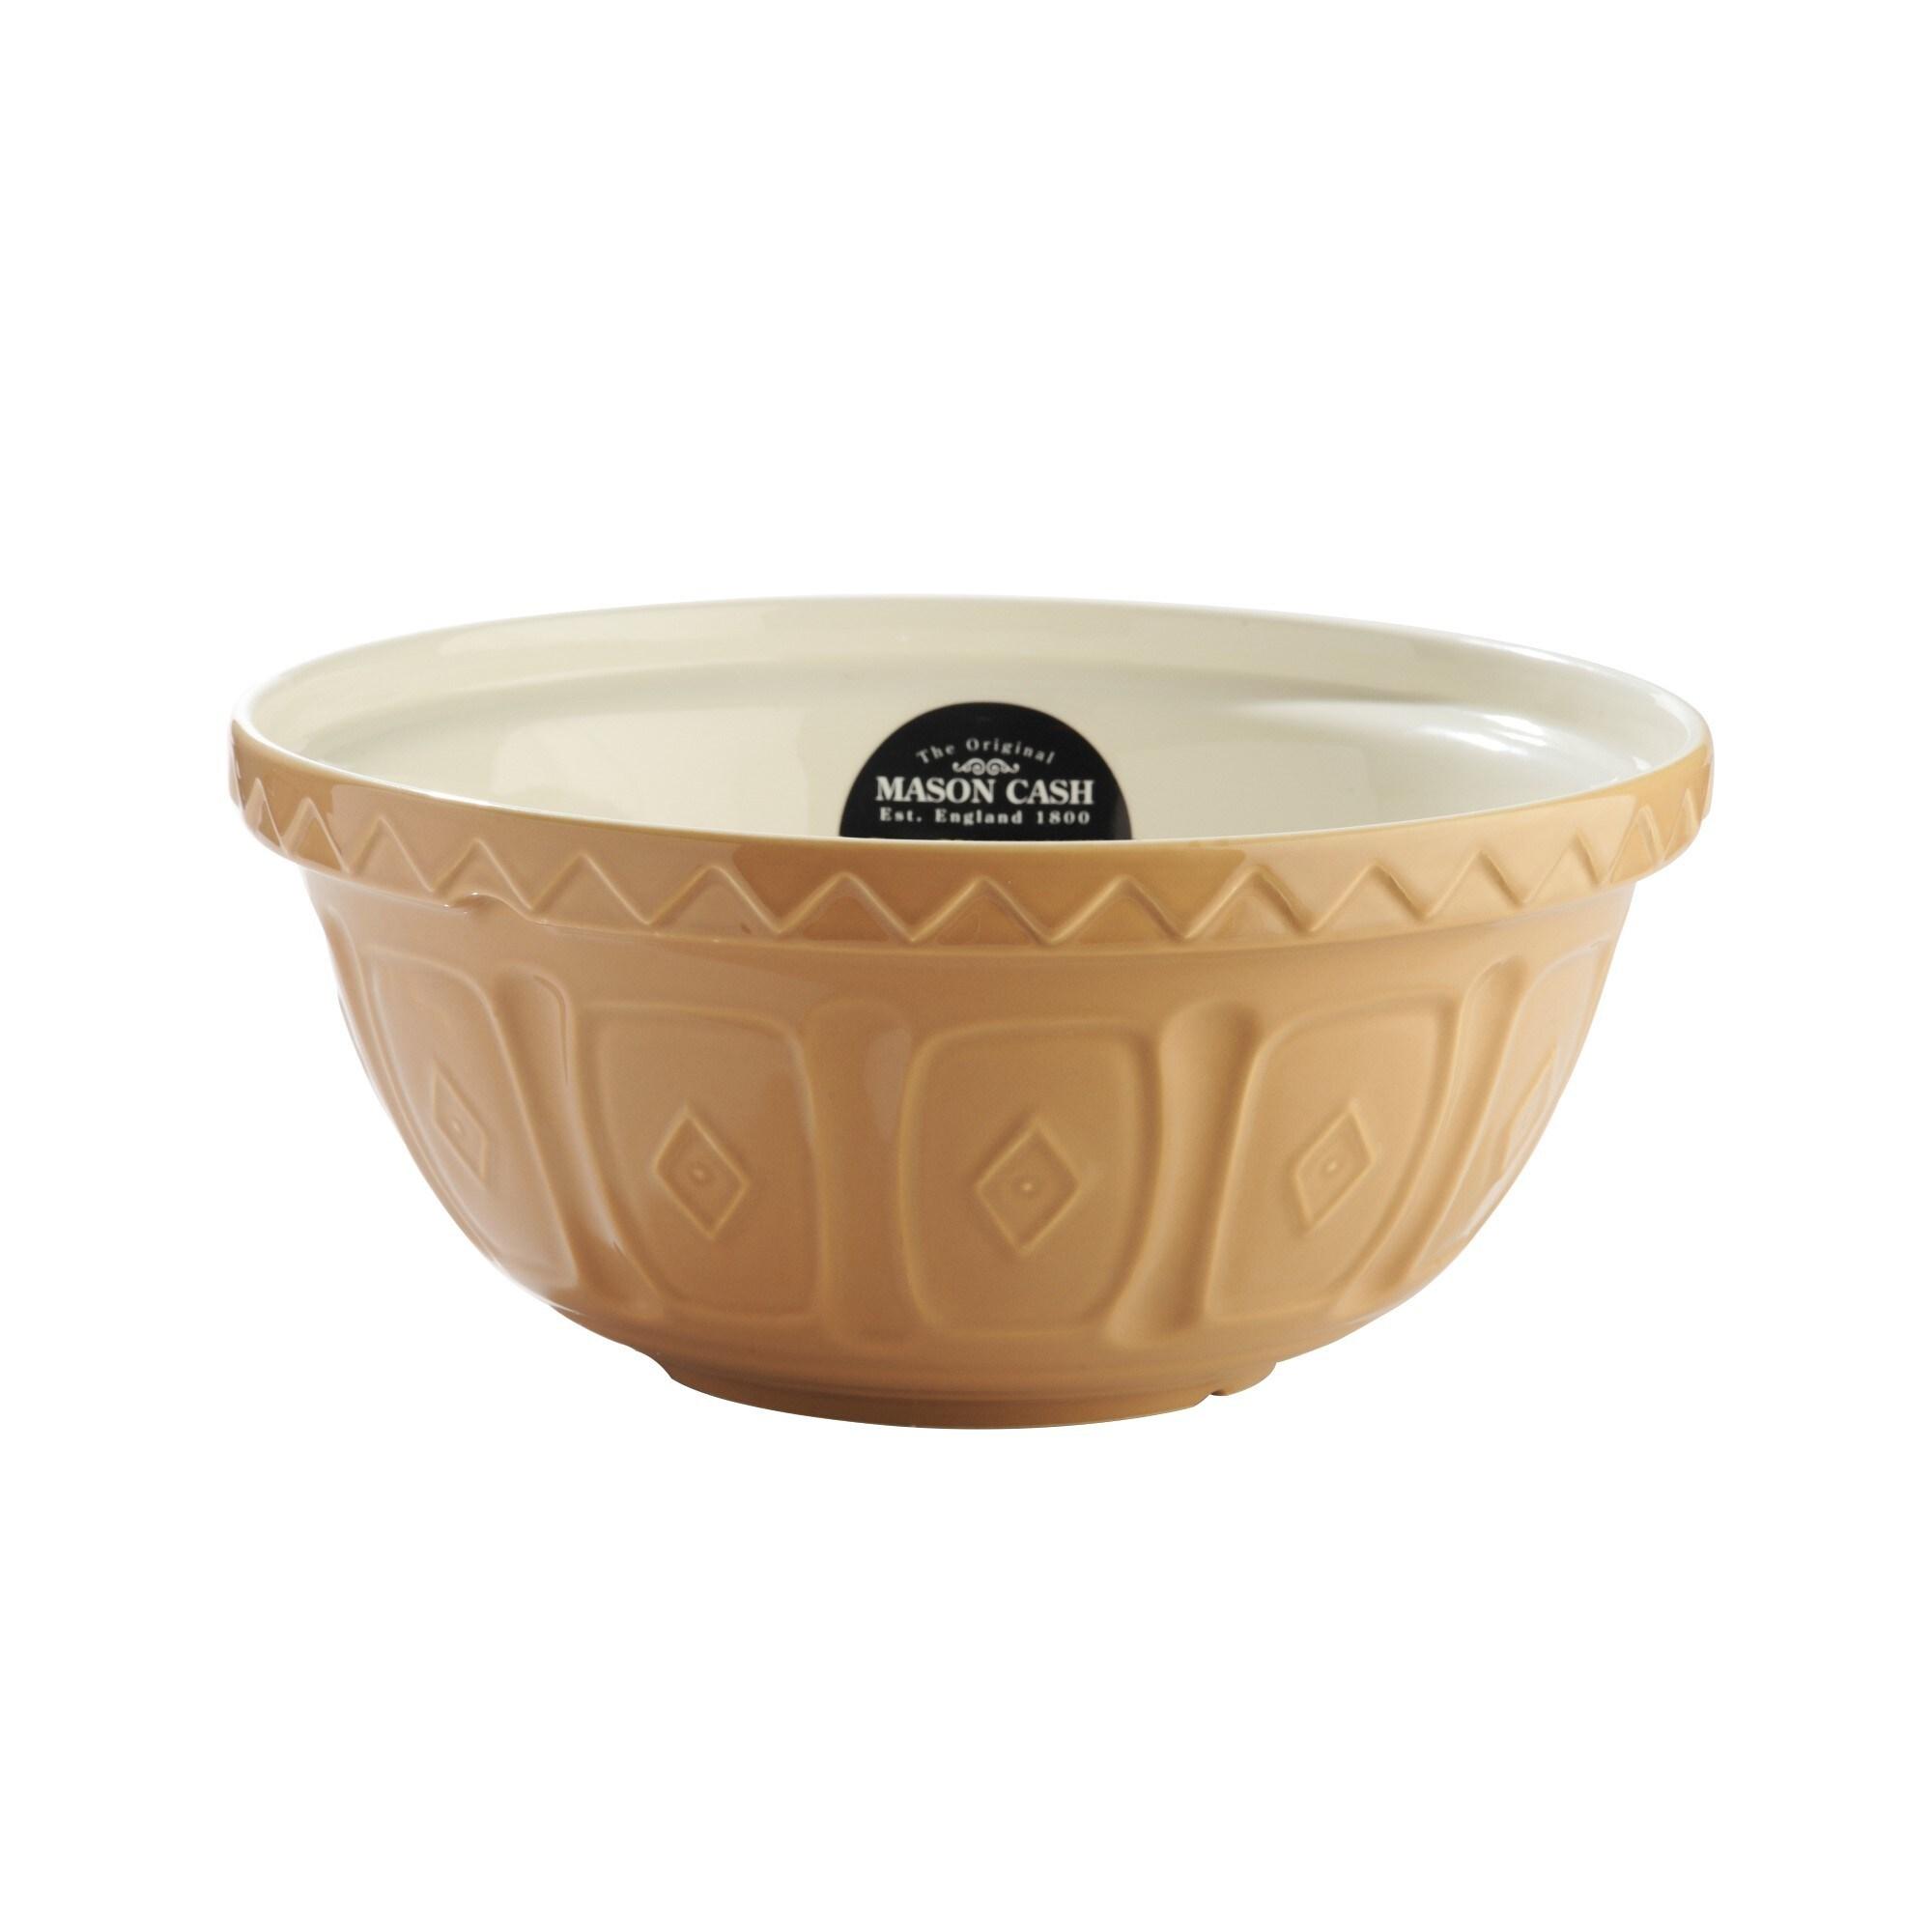 "Typhoon Mason Cash Cane Mixing Bowl (11.5"" Cane colored M..."